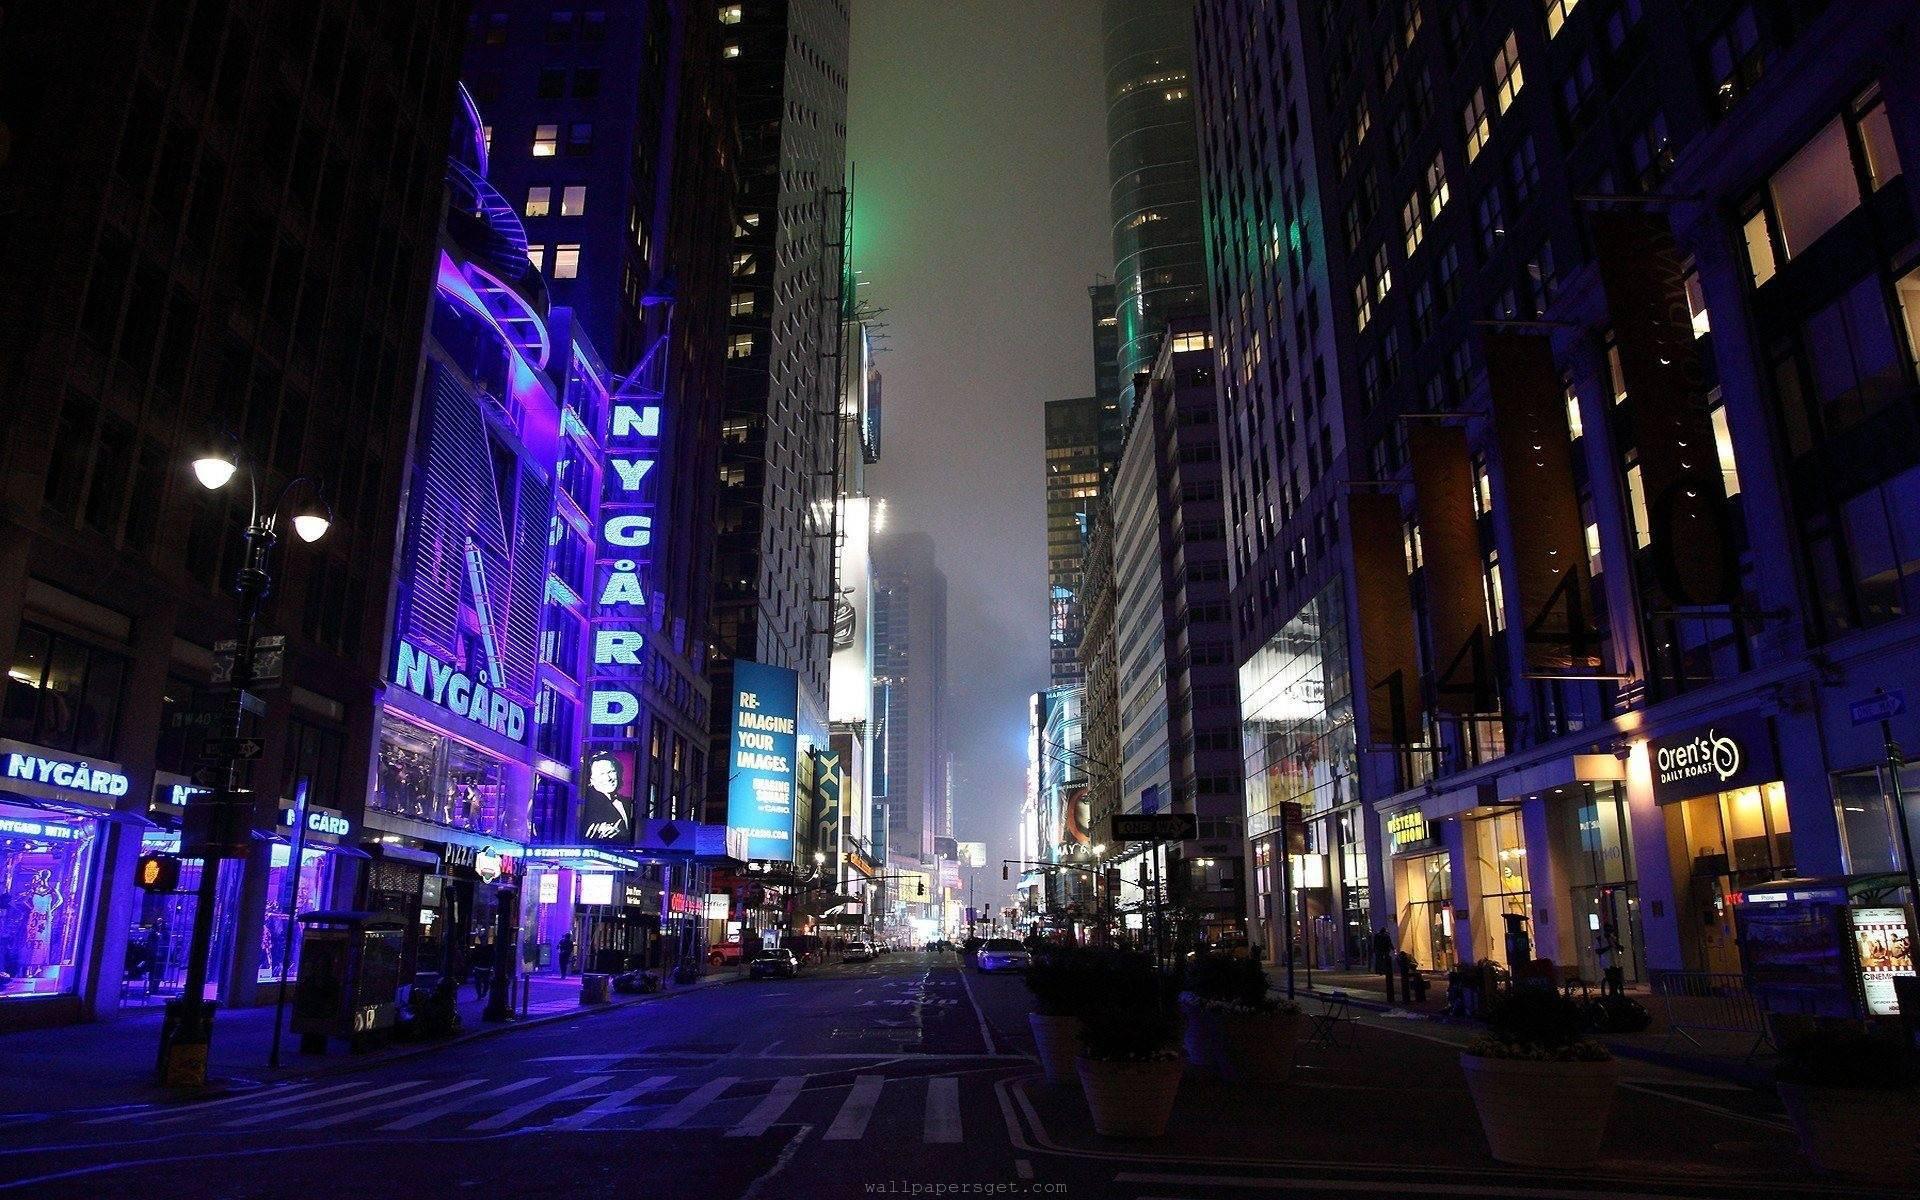 Shop Street at night of New York city wallpaper 1920x1200